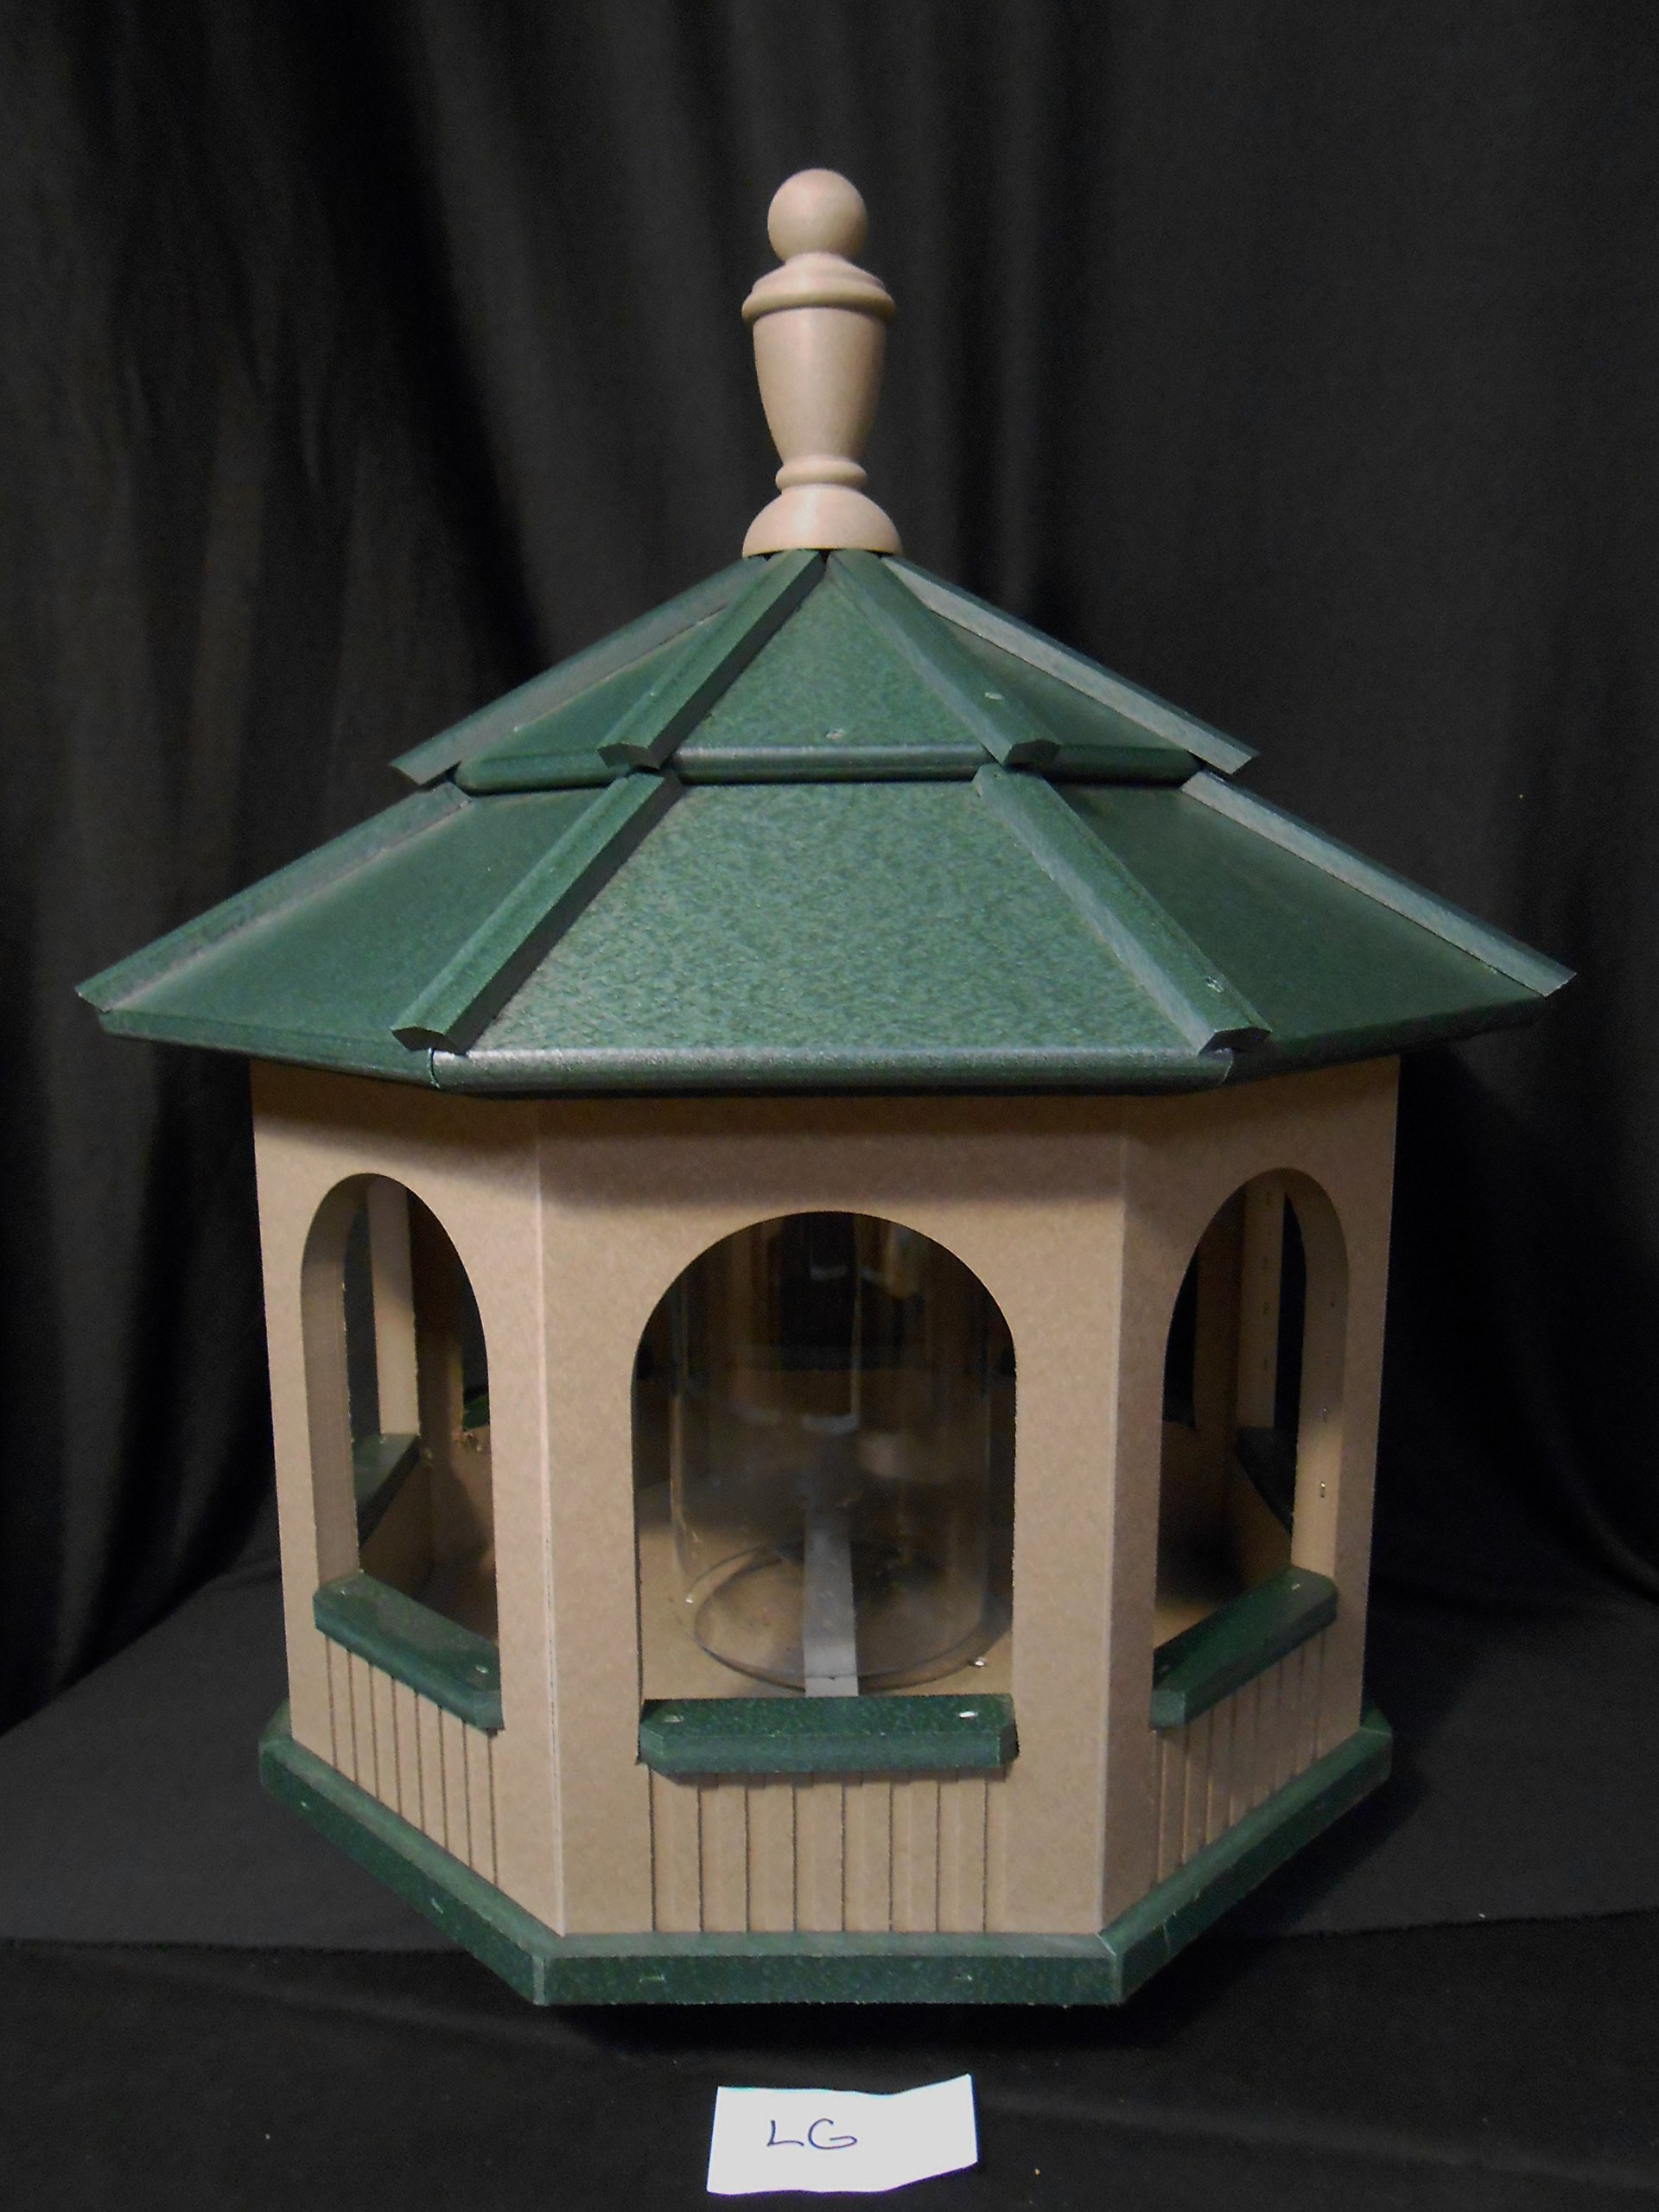 Large Gazebo Vinyl Bird Feeder Amish Homemade Handmade Handcrafted Clay & Green